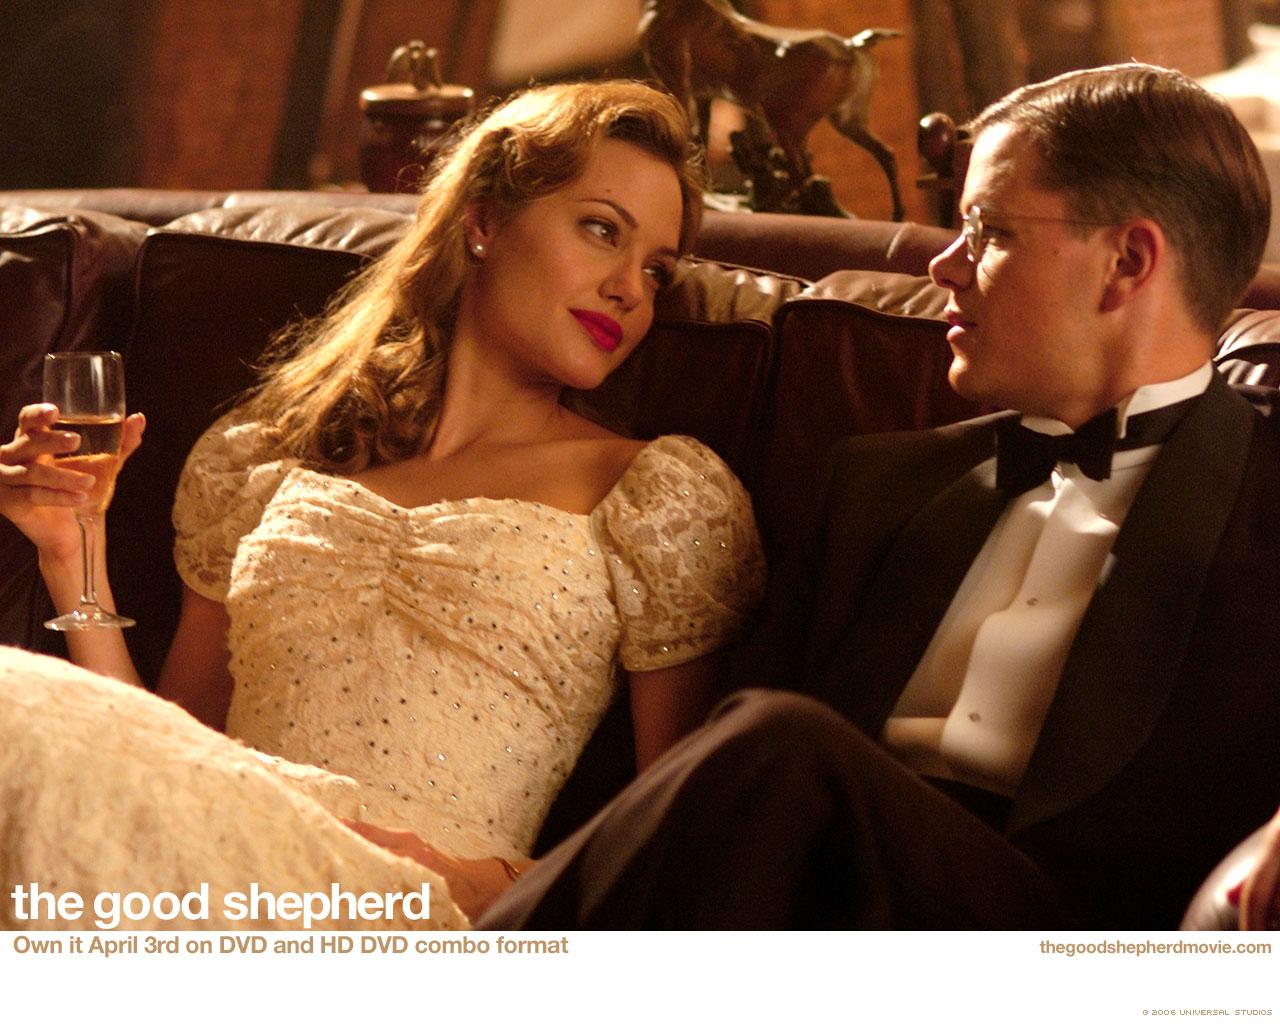 http://1.bp.blogspot.com/_Yij3nt3zMNA/SzMCl-OsM5I/AAAAAAAAJn0/Pu4DC9Fnbo8/s1600/The_Good_Shepherd,_2006,_Angelina_Jolie,_Matt_Damon.jpg